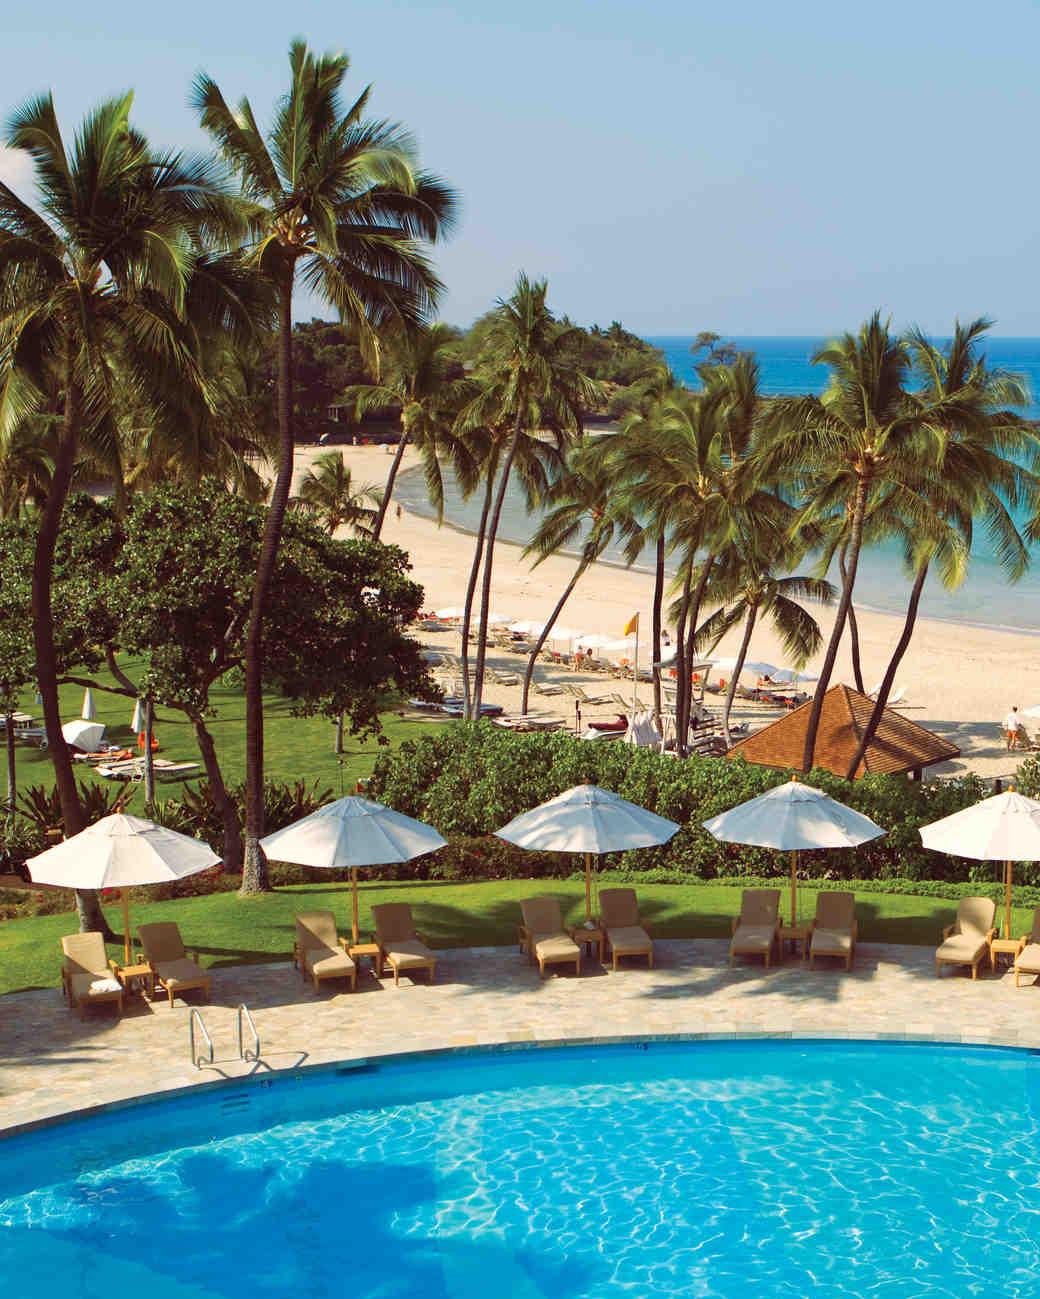 mauna-kea-beach-hotel-pool-beach-s111950.jpg